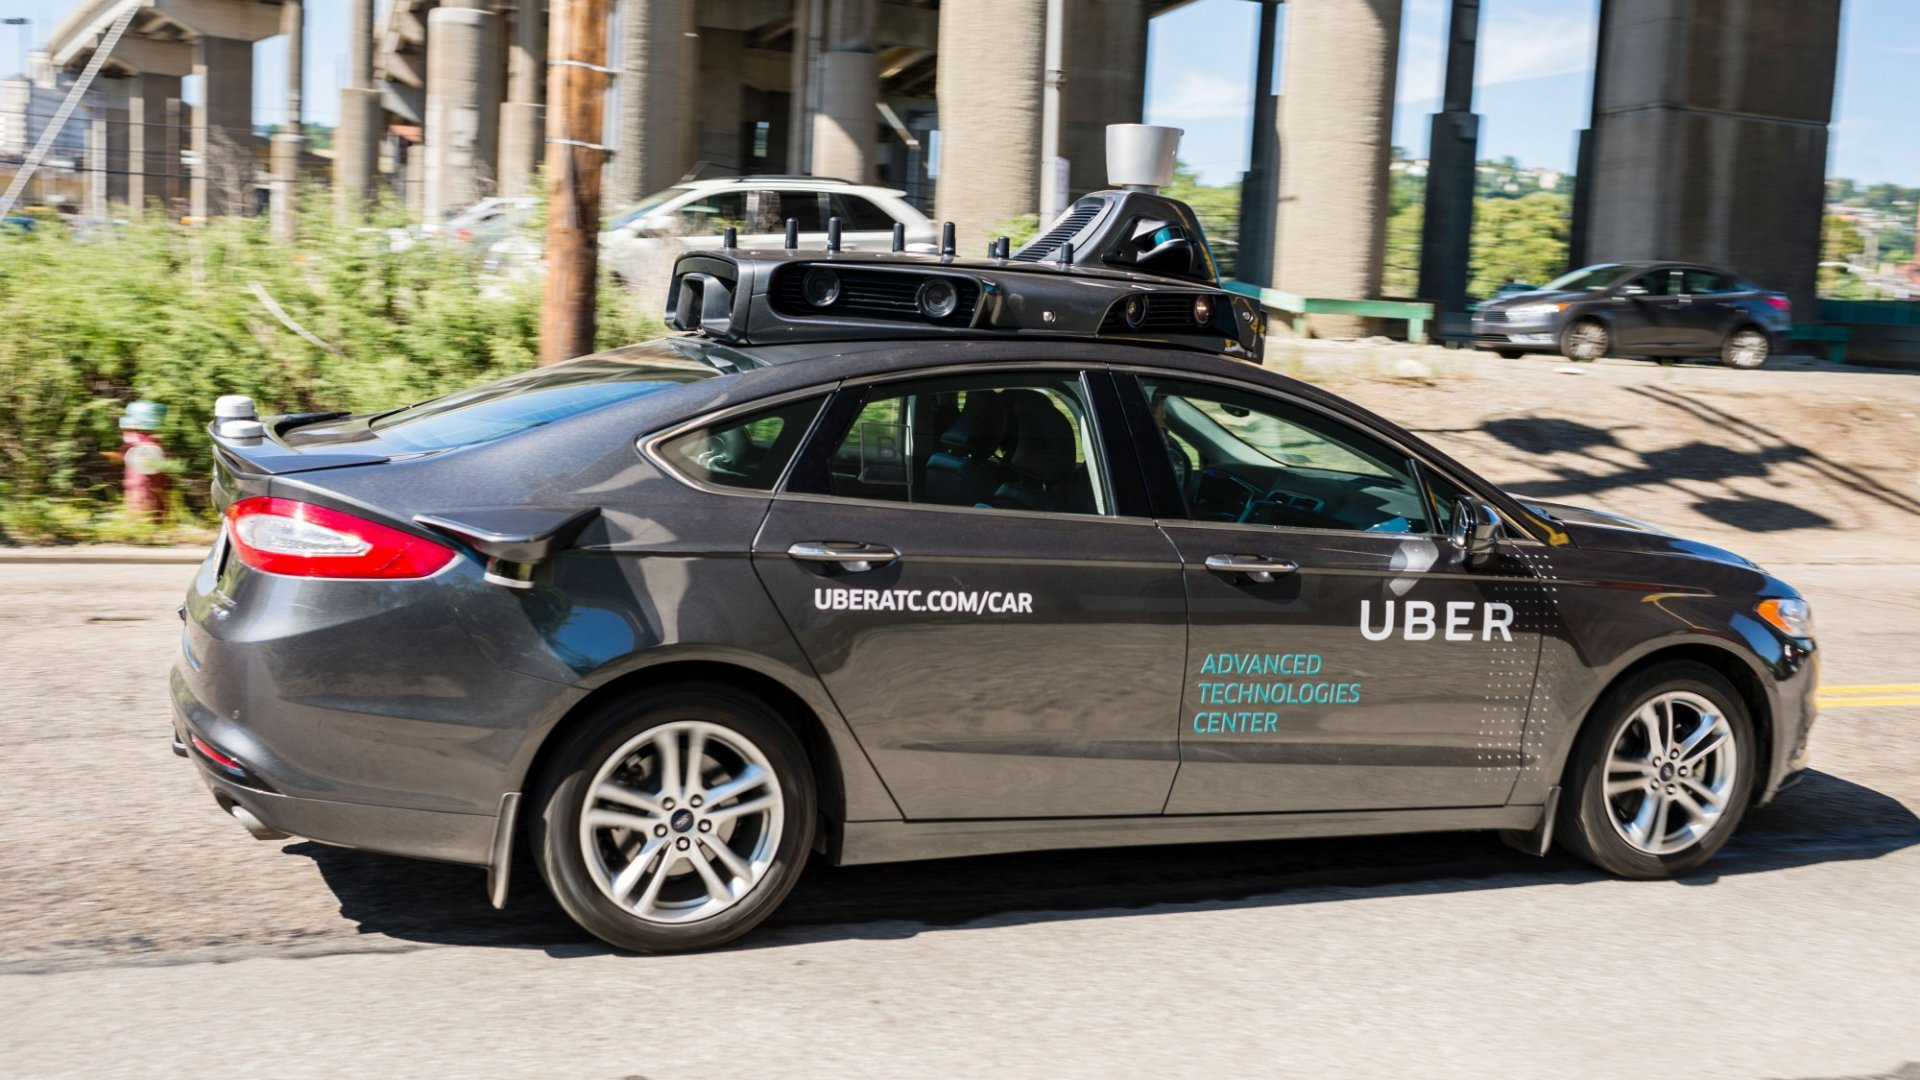 Uber Sends Self-Driving Cars to Arizona